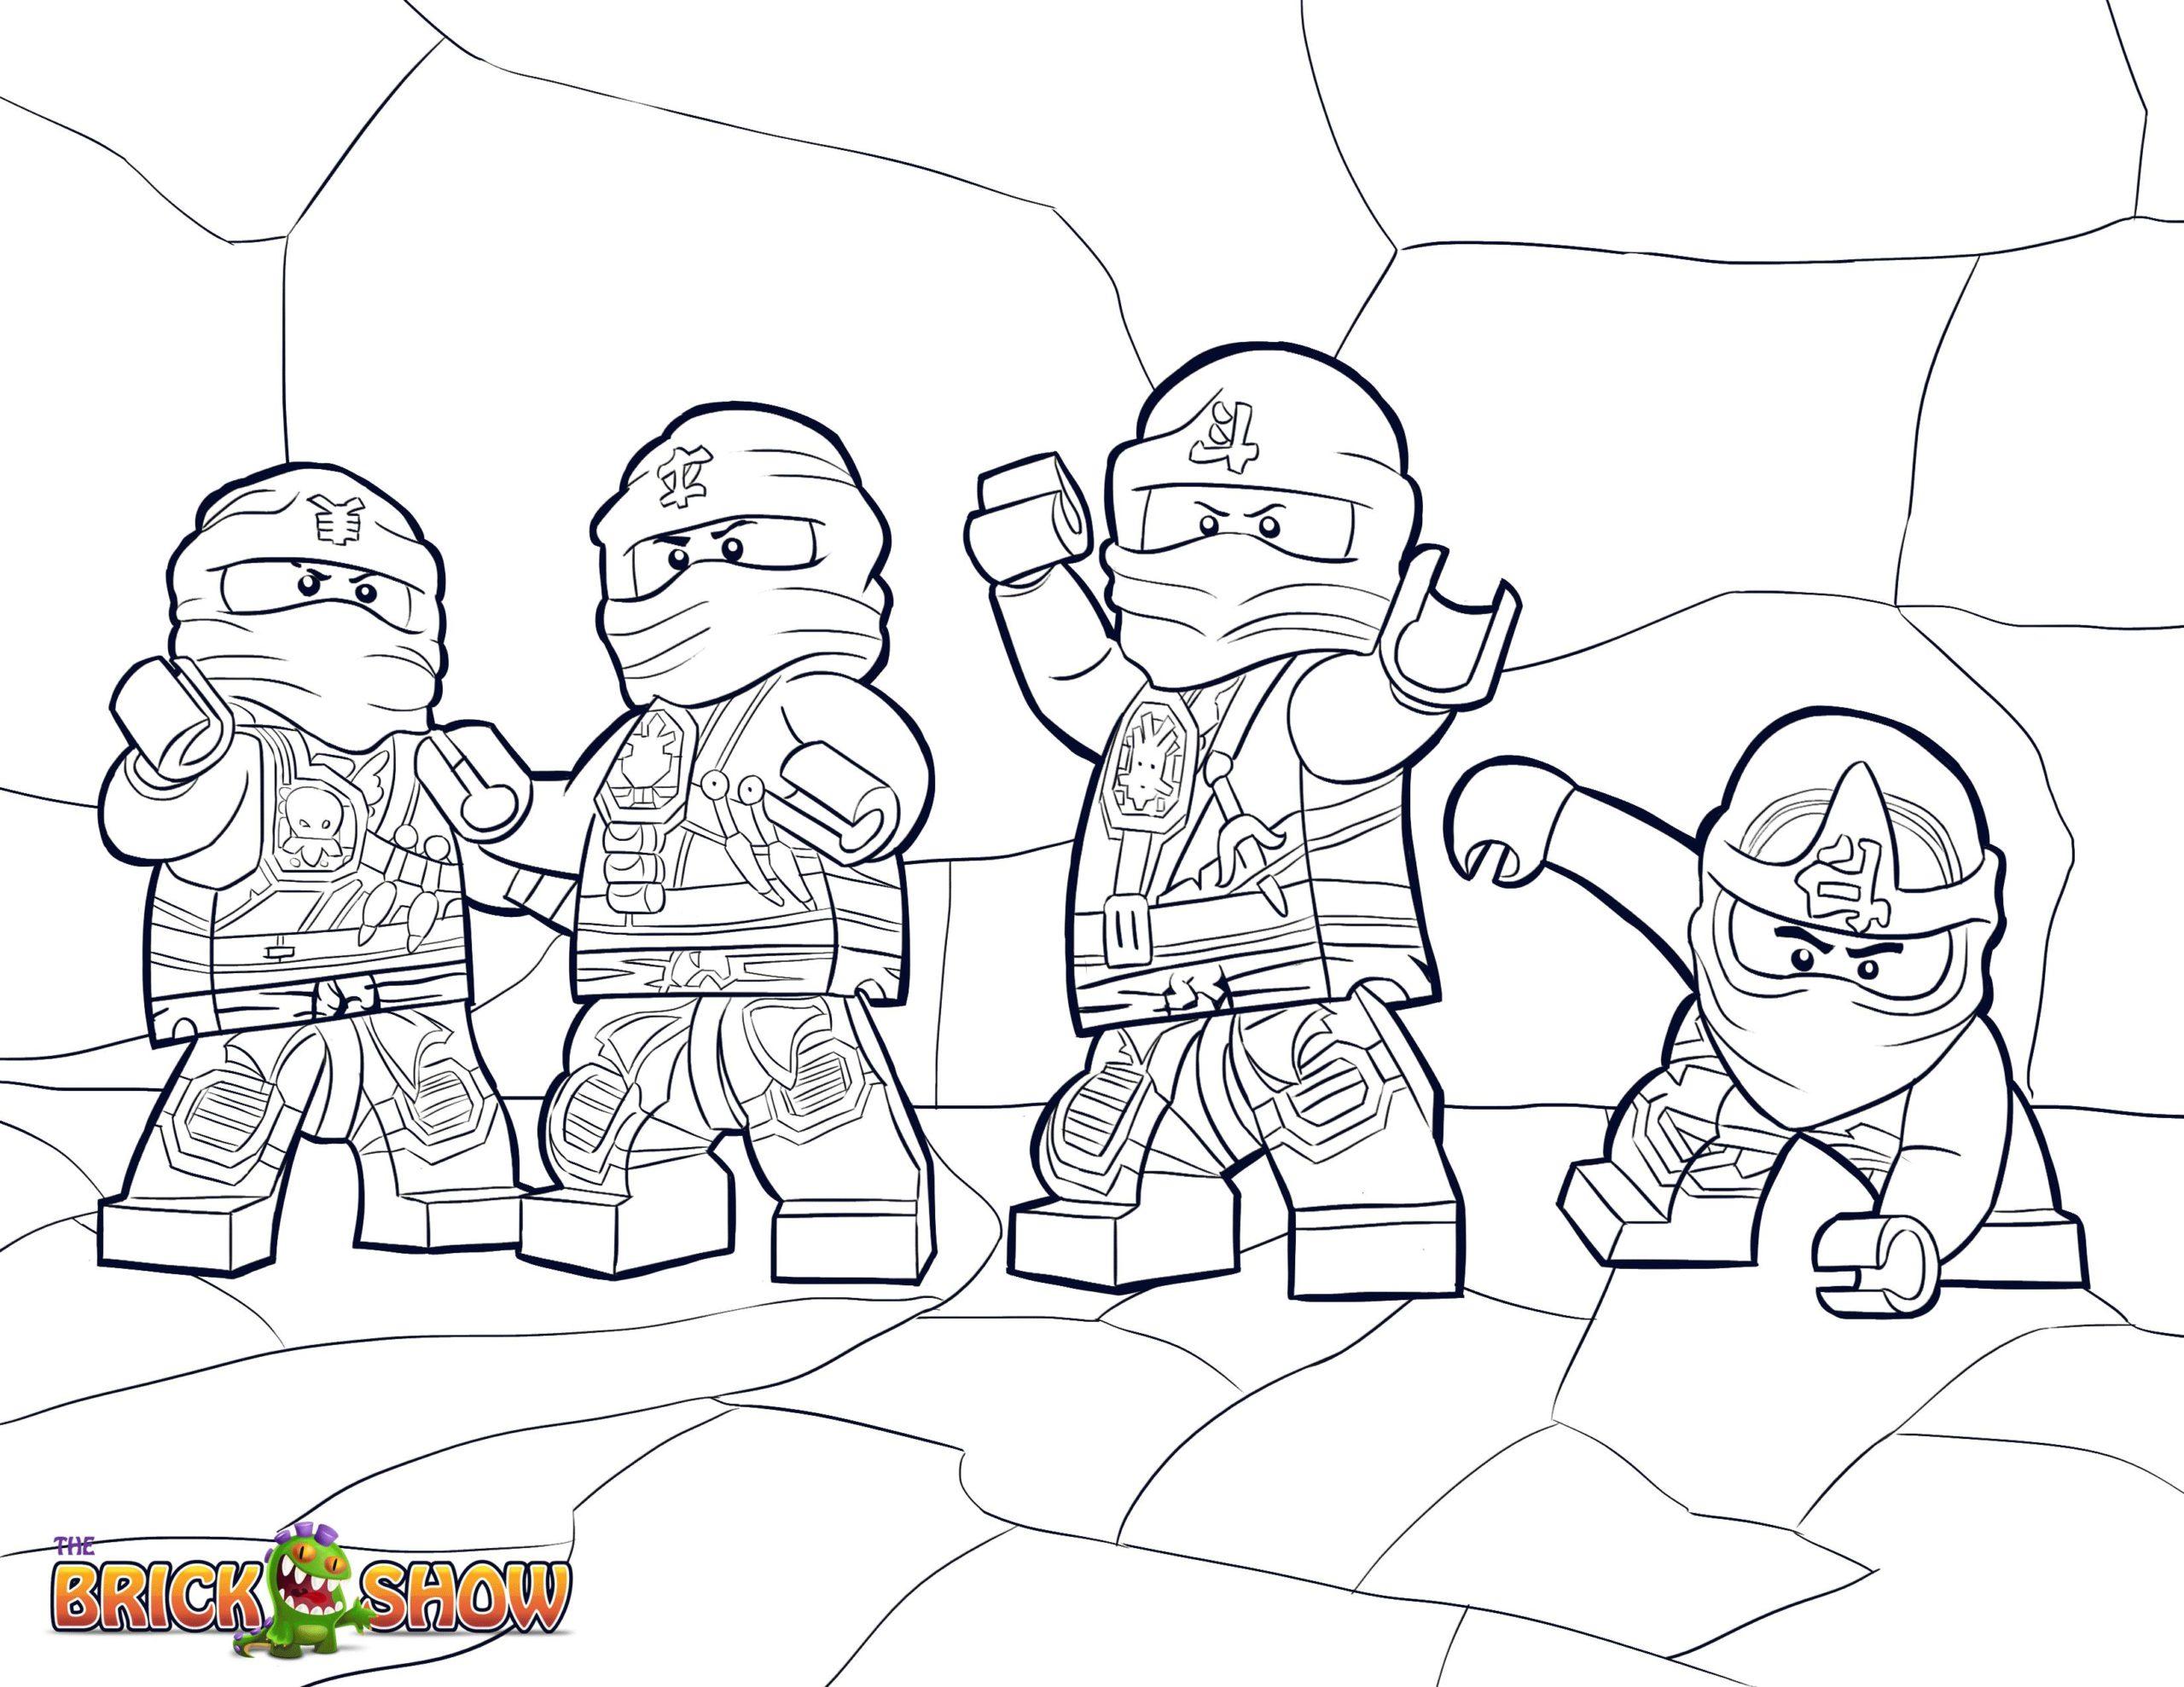 Coloriage Lego Ninjago A Imprimer Gratuit Coloriage Imprimer